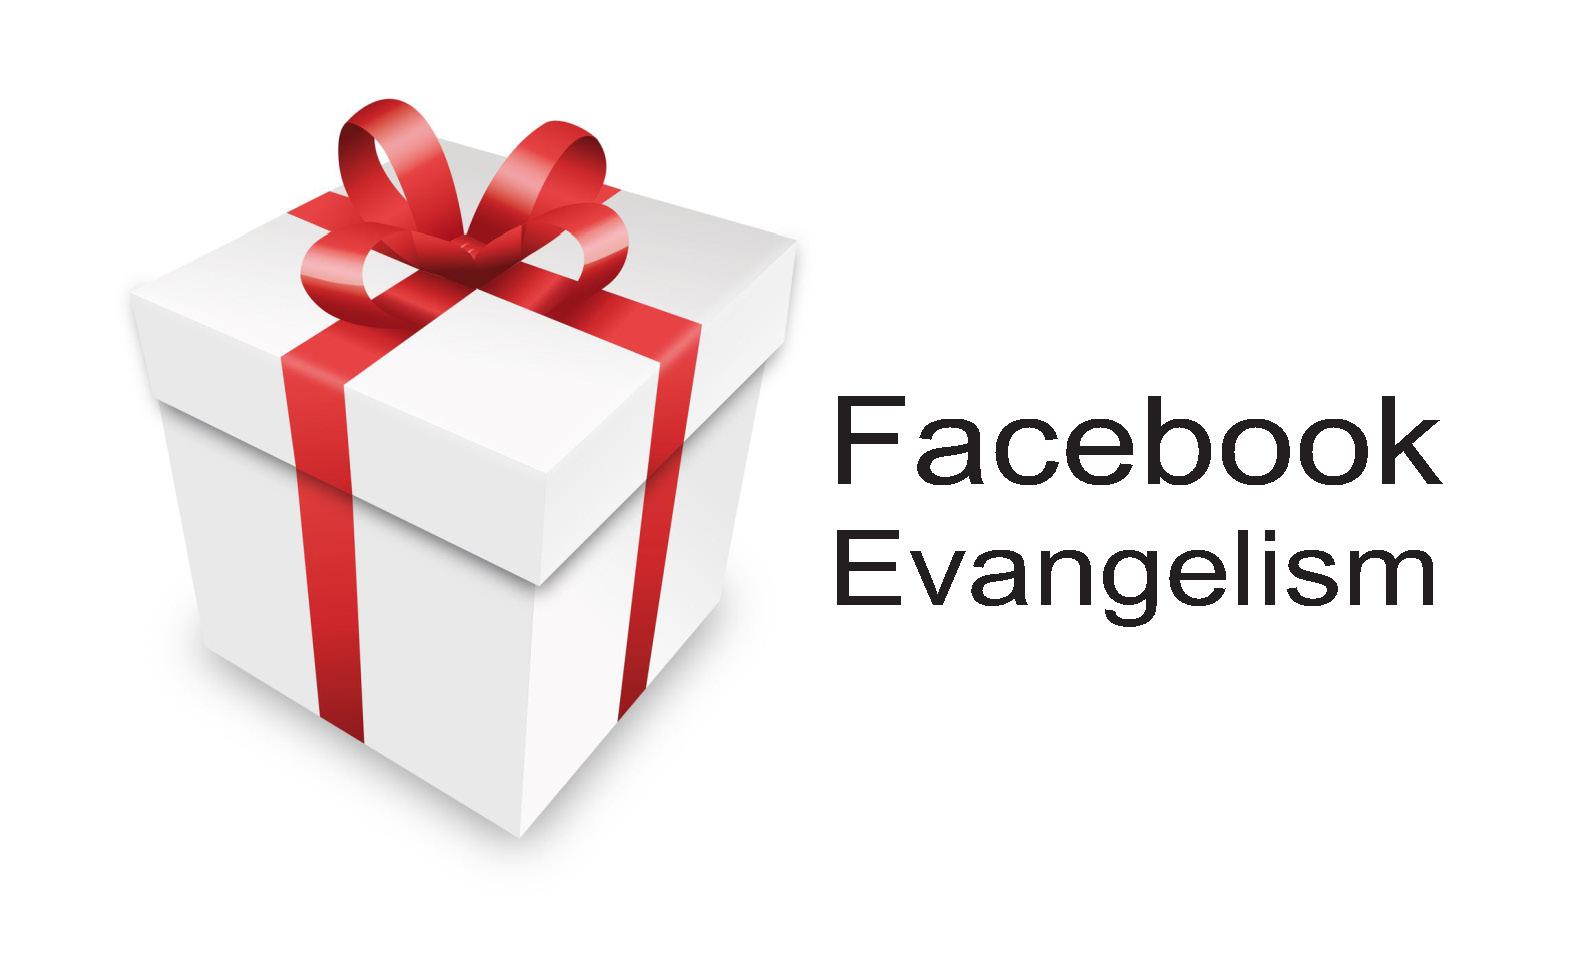 Facebook Evangelism